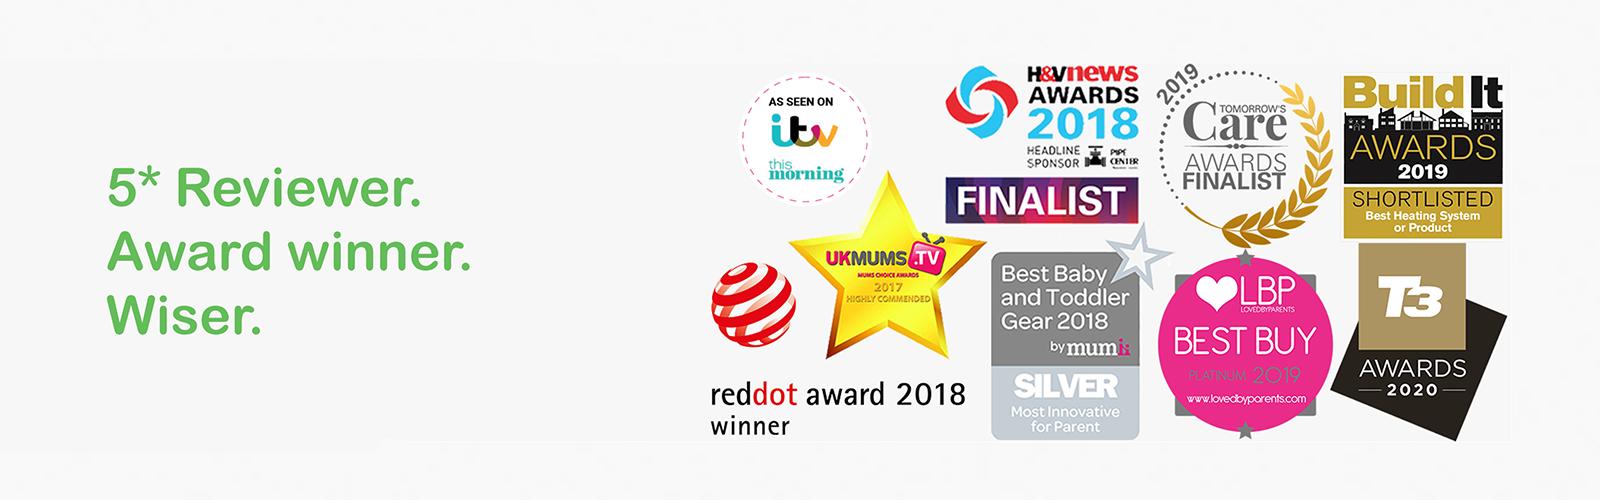 award winning 5 star review for wiser